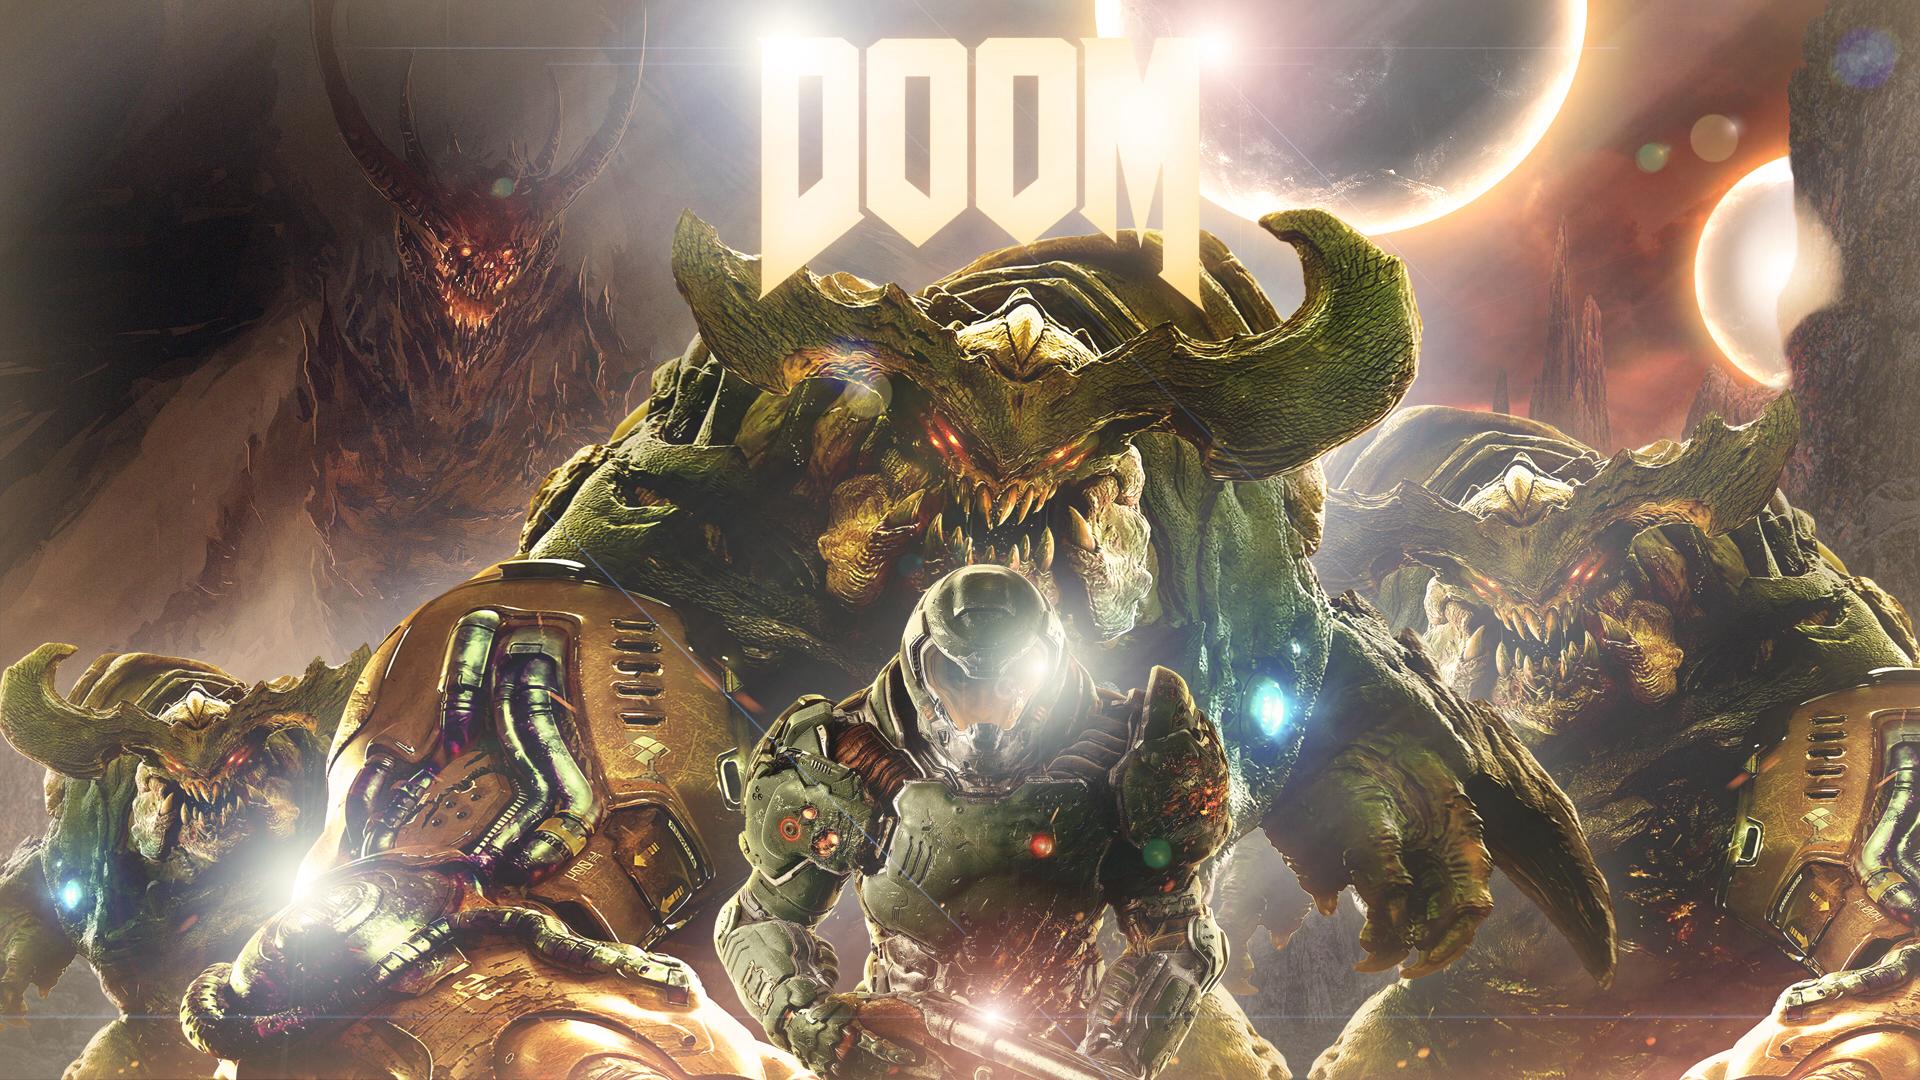 live doom 4 wallpapers - photo #8